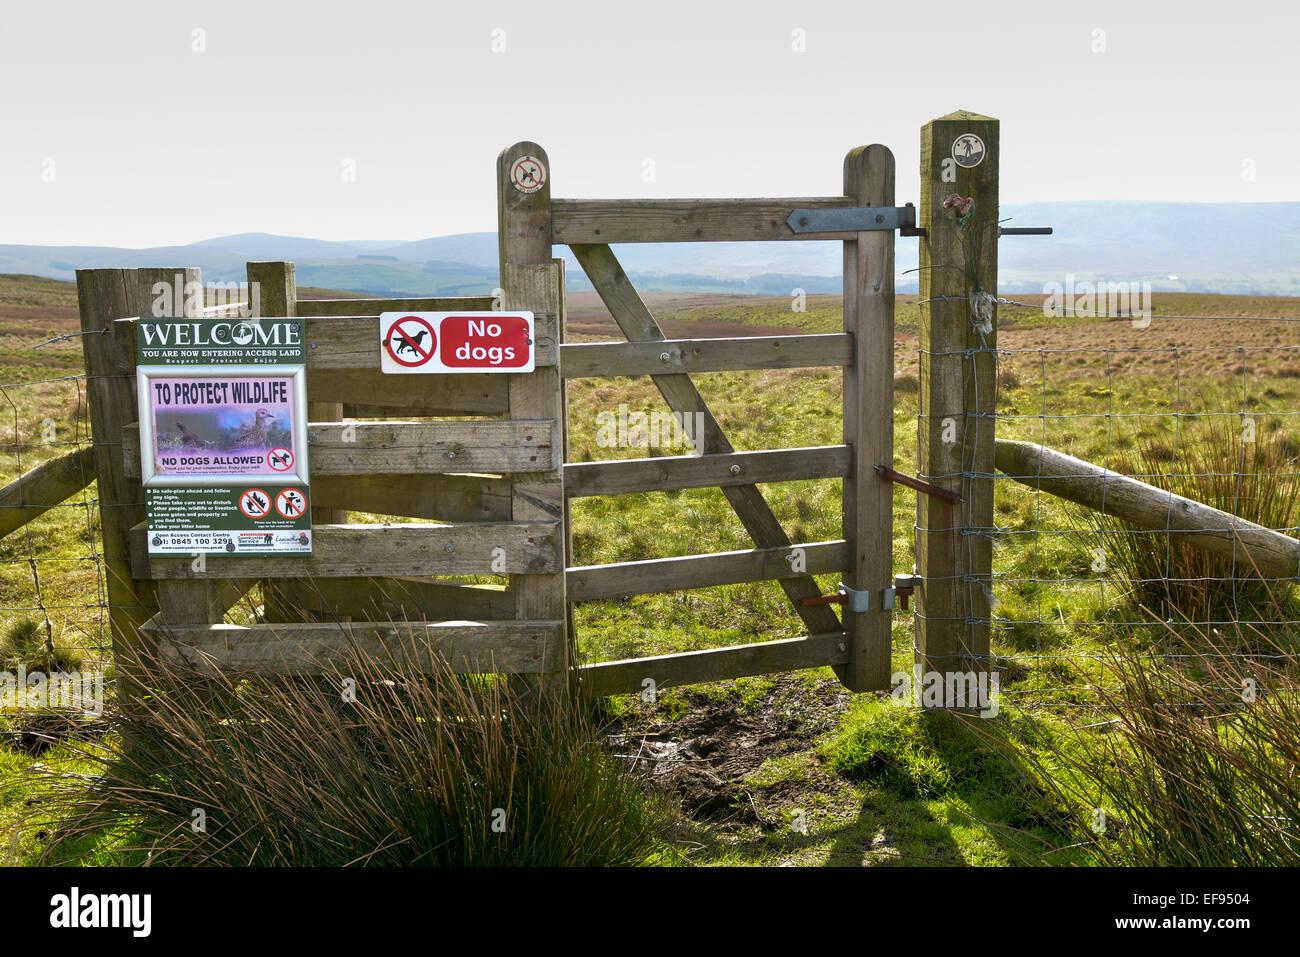 Puerta de acceso en páramos, con orientación signos, Lancashire, Reino Unido. Imagen De Stock